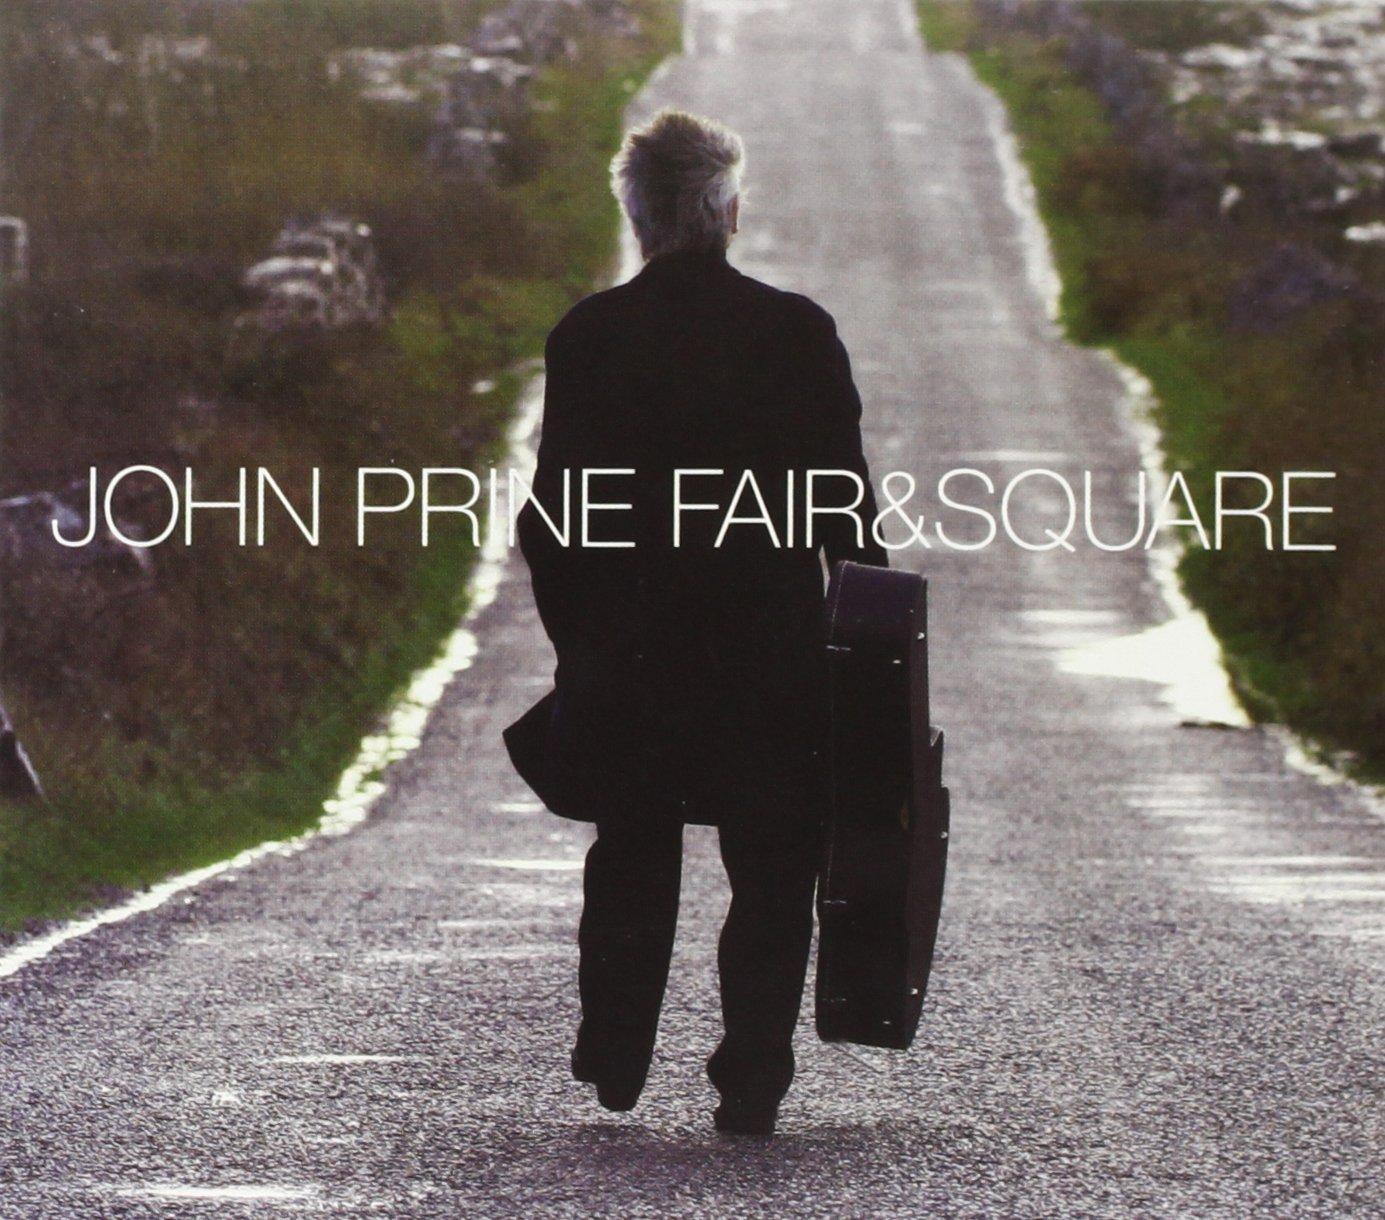 Fair & Square by PRINE,JOHN